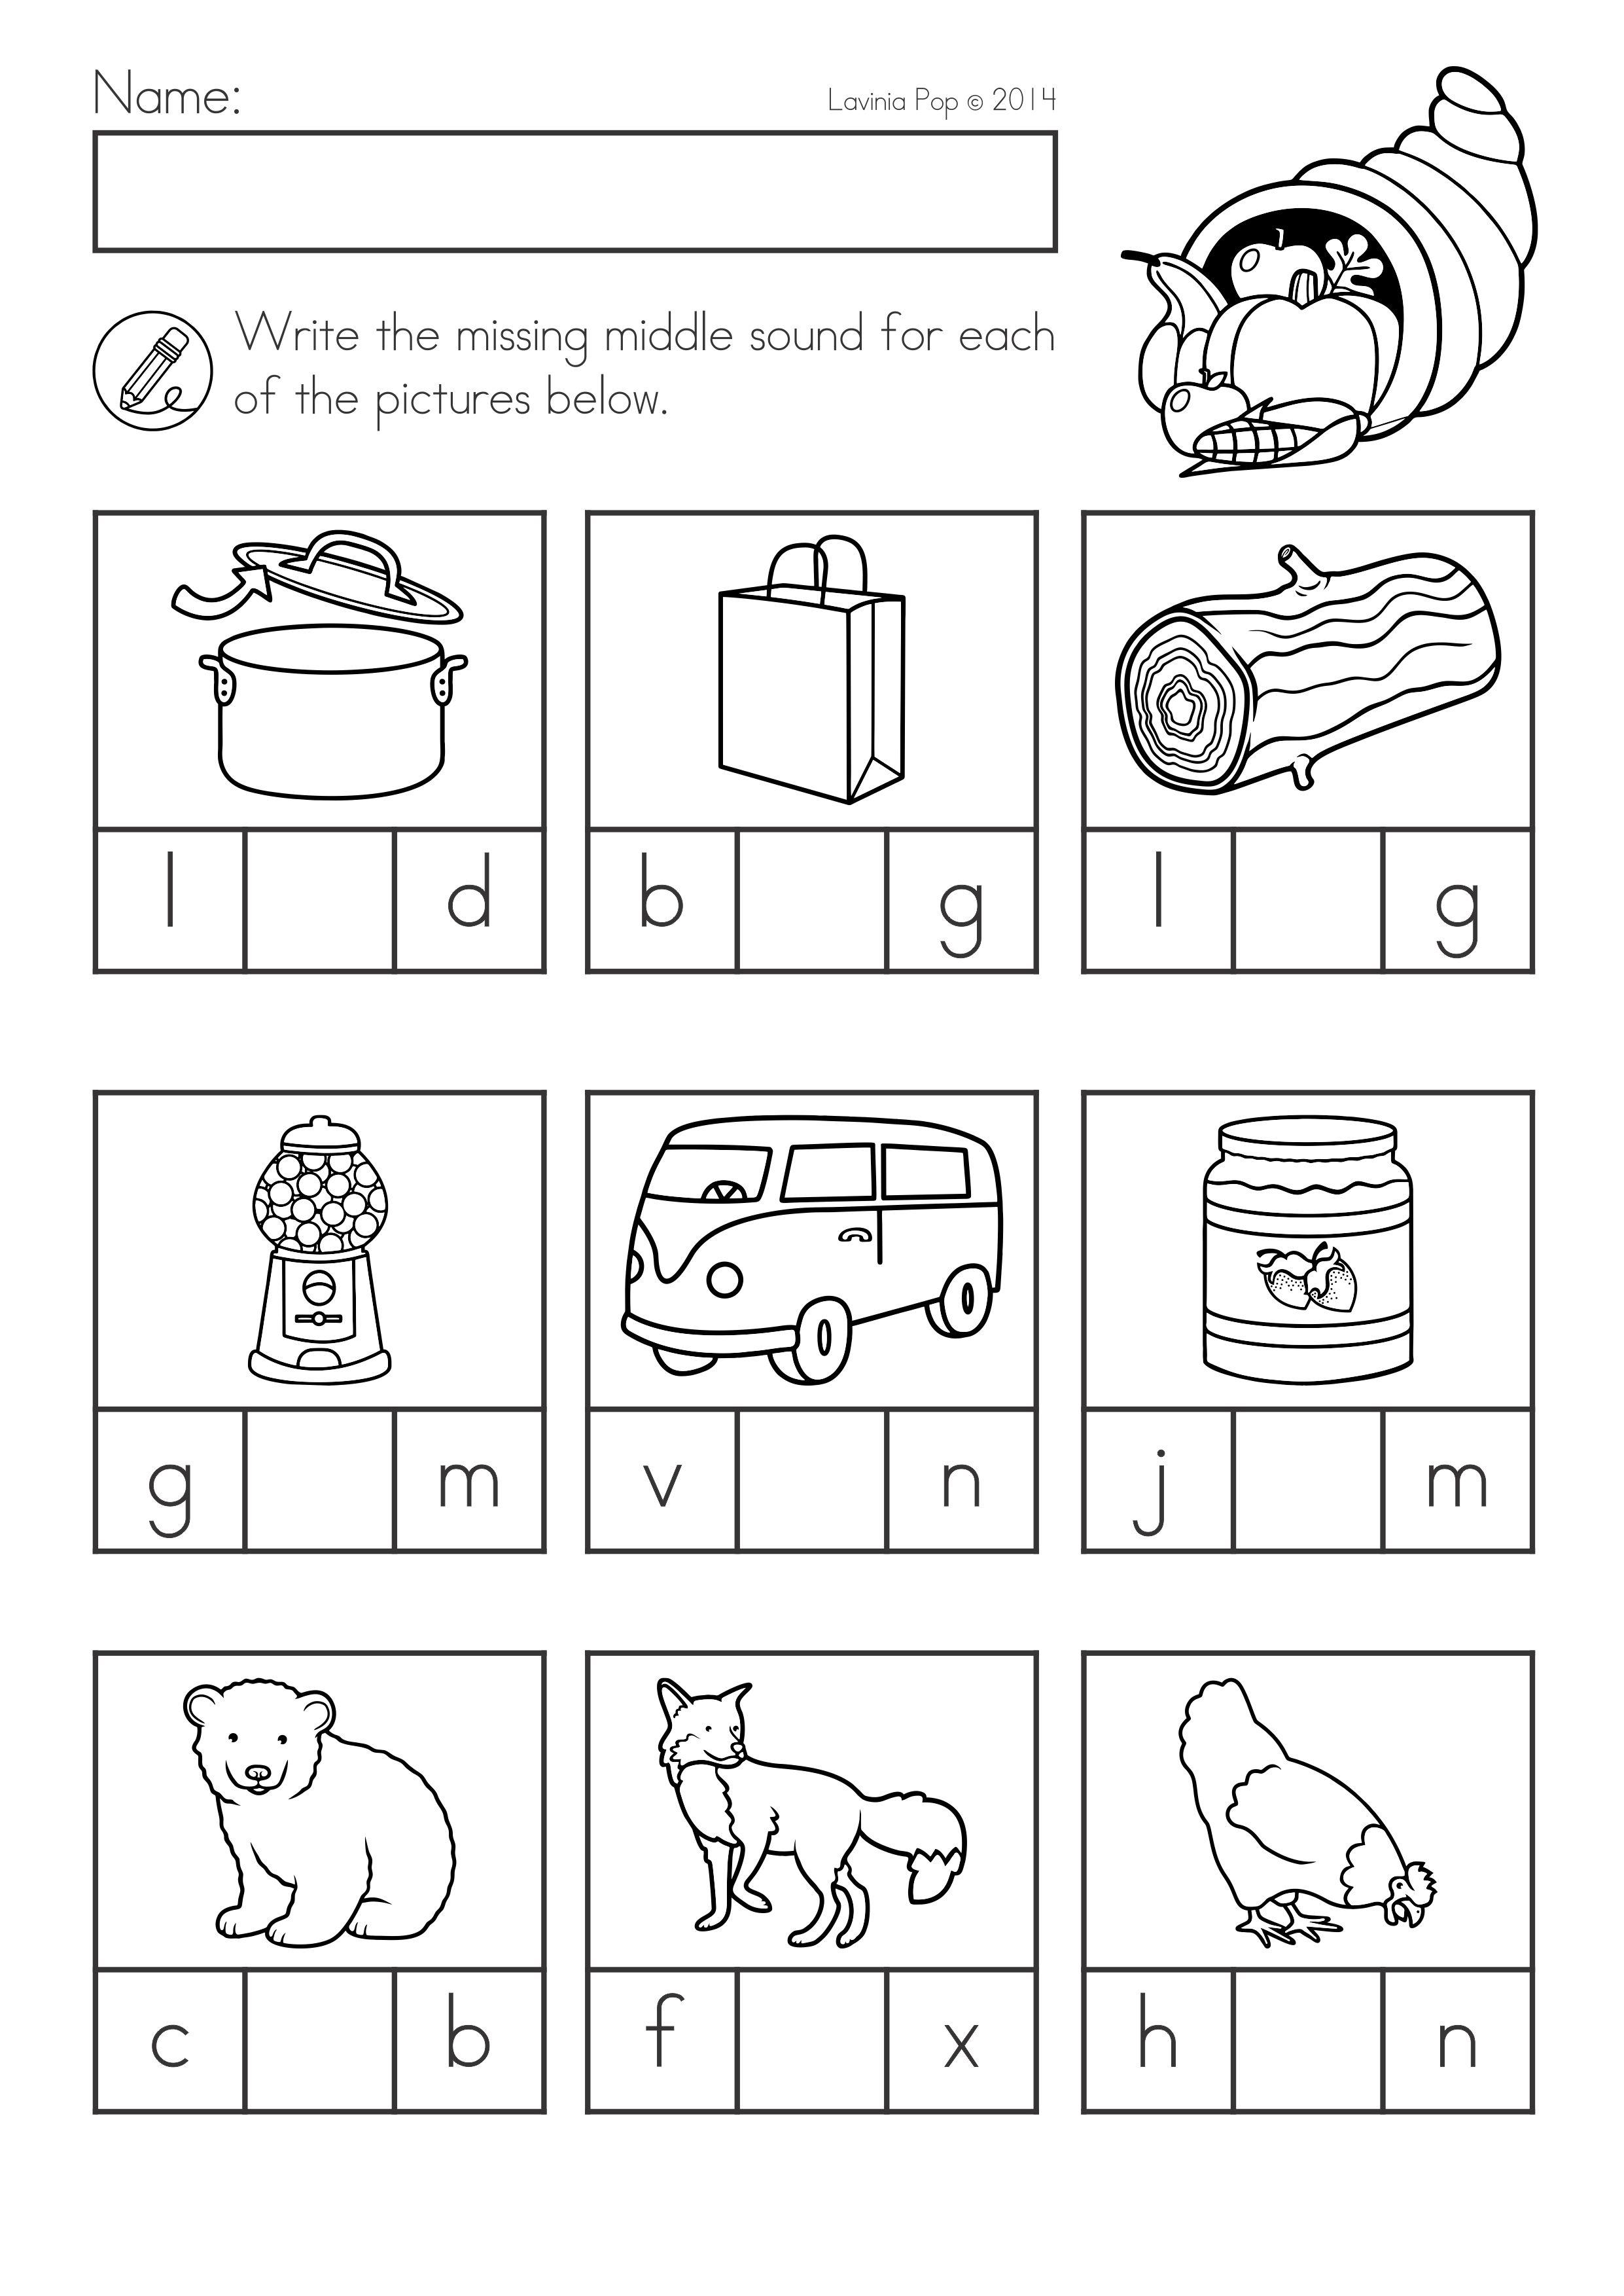 Kinder Garden: Thanksgiving Math & Literacy Worksheets And Activities